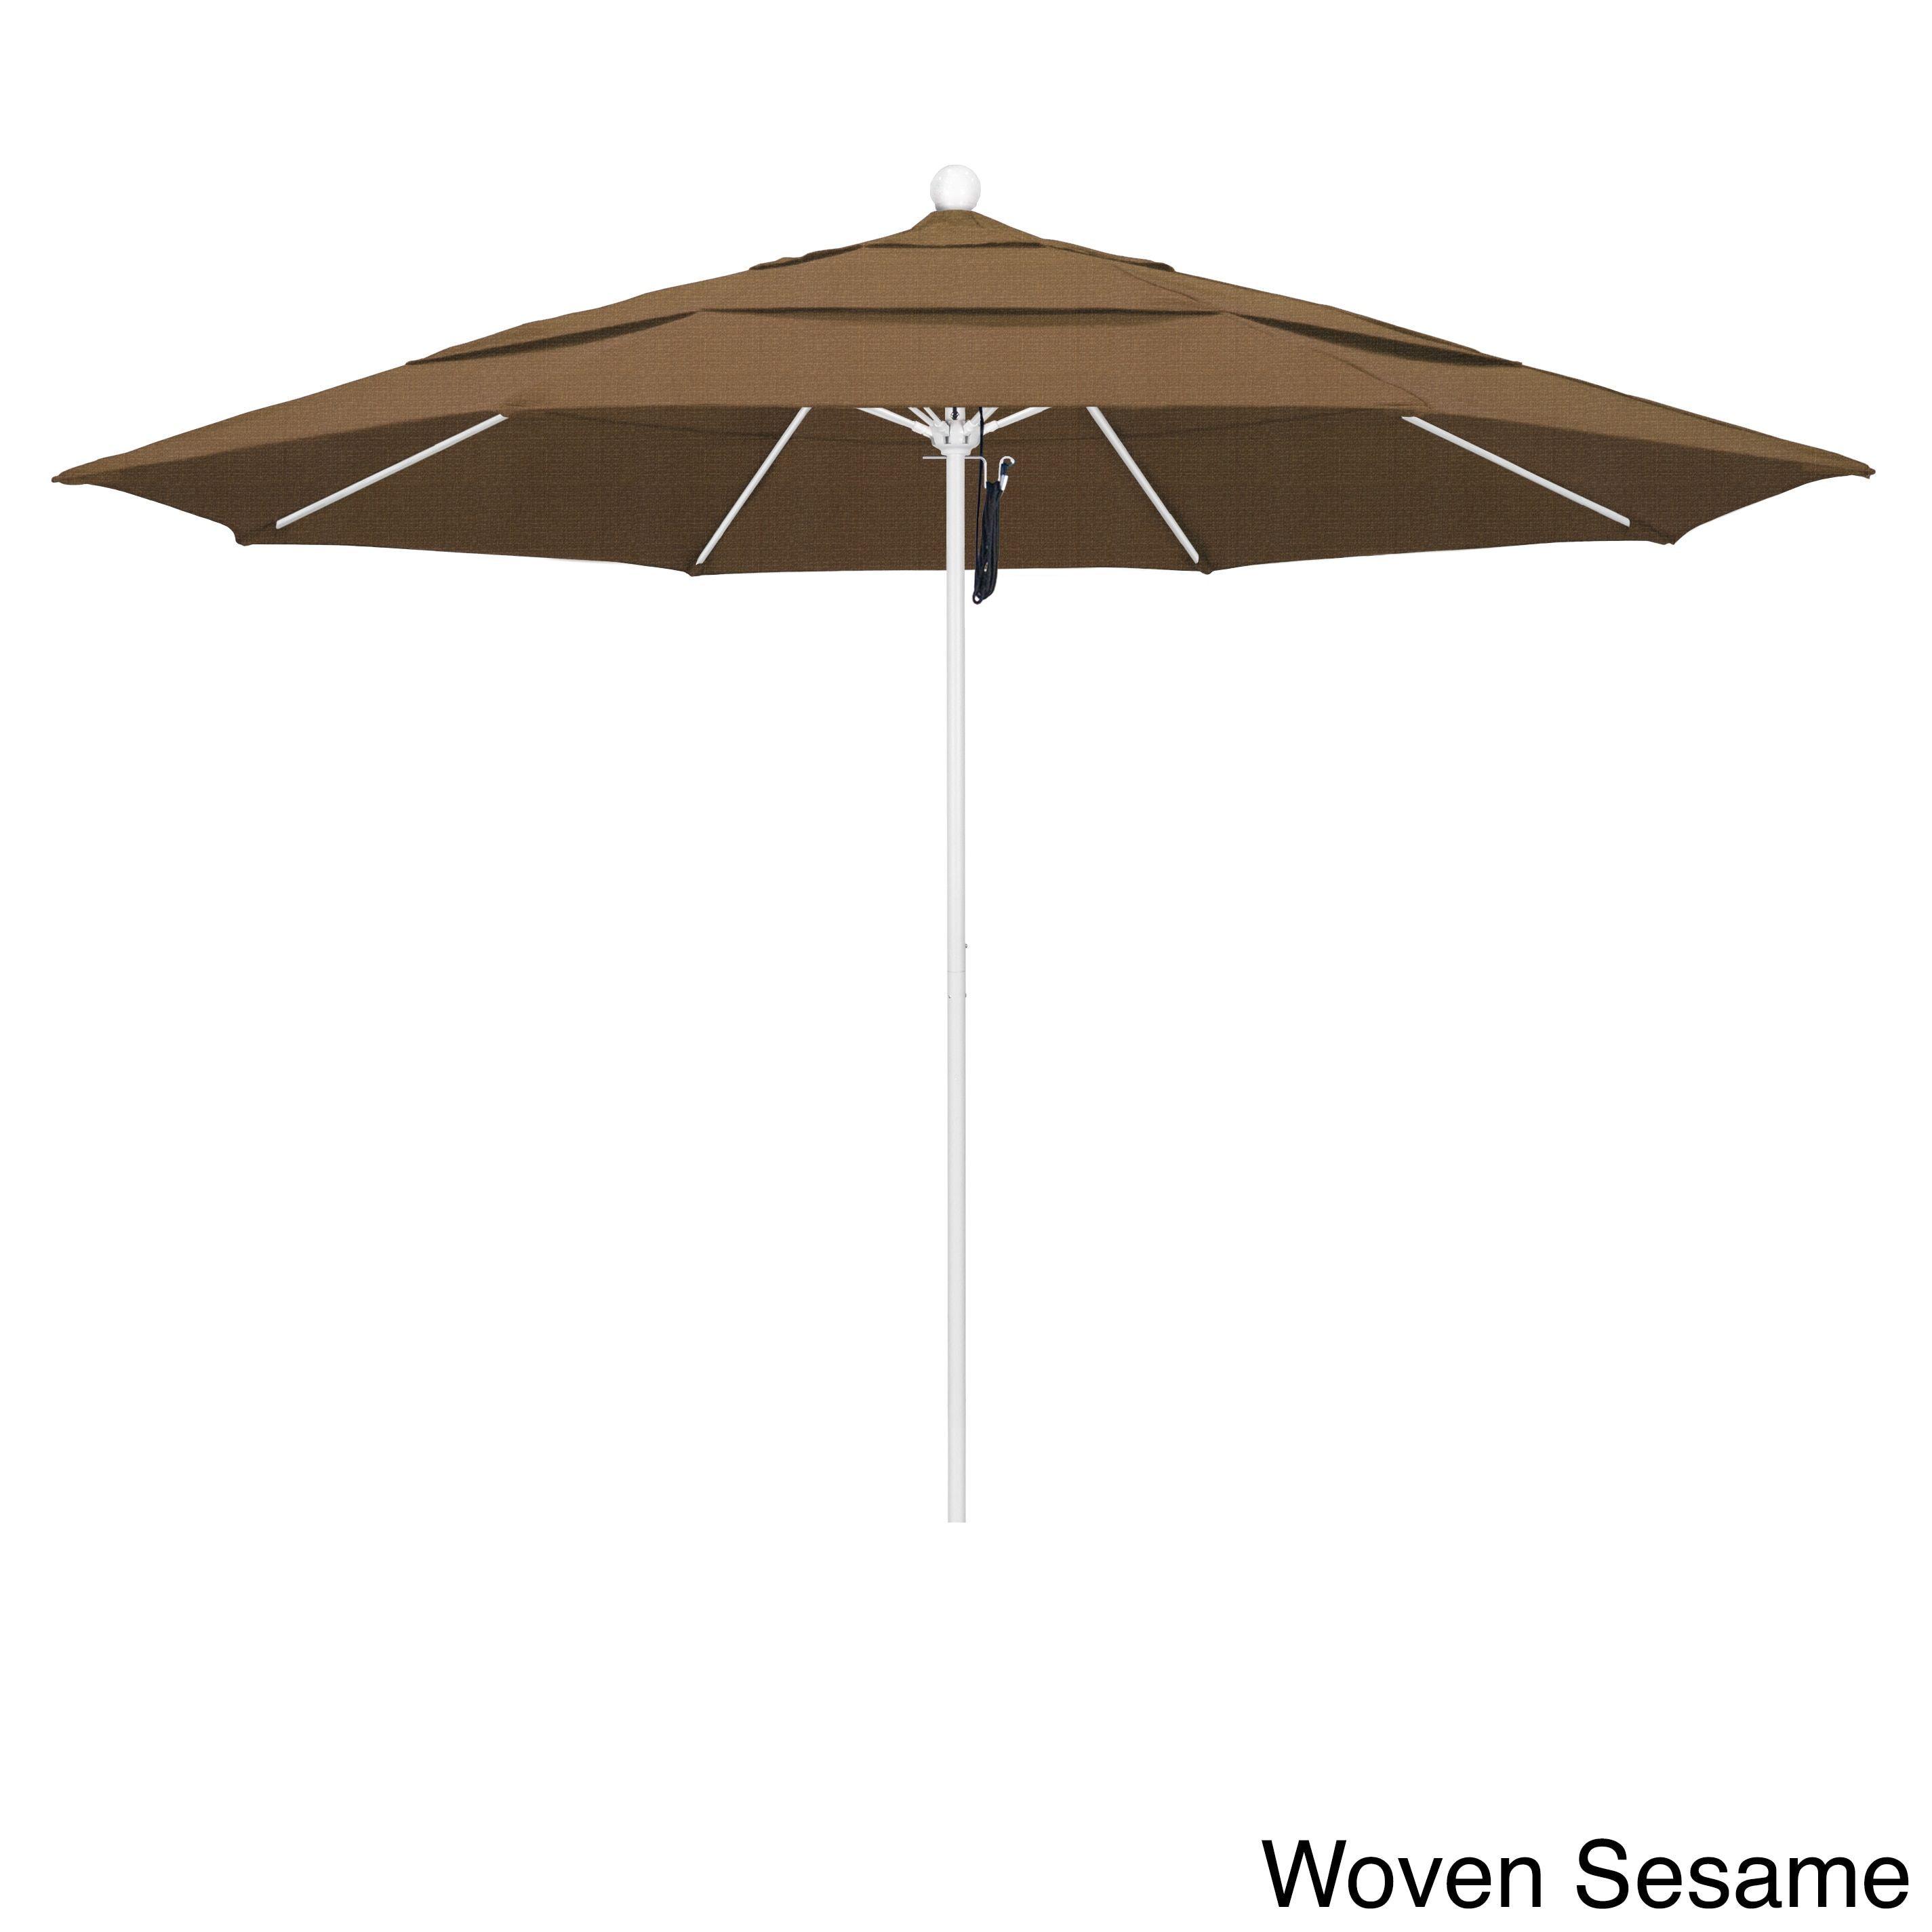 California Umbrella 11' Rd Frame, Fiberglass Rib Market Umbrella, Push Open, Finish, Olefin Fabric